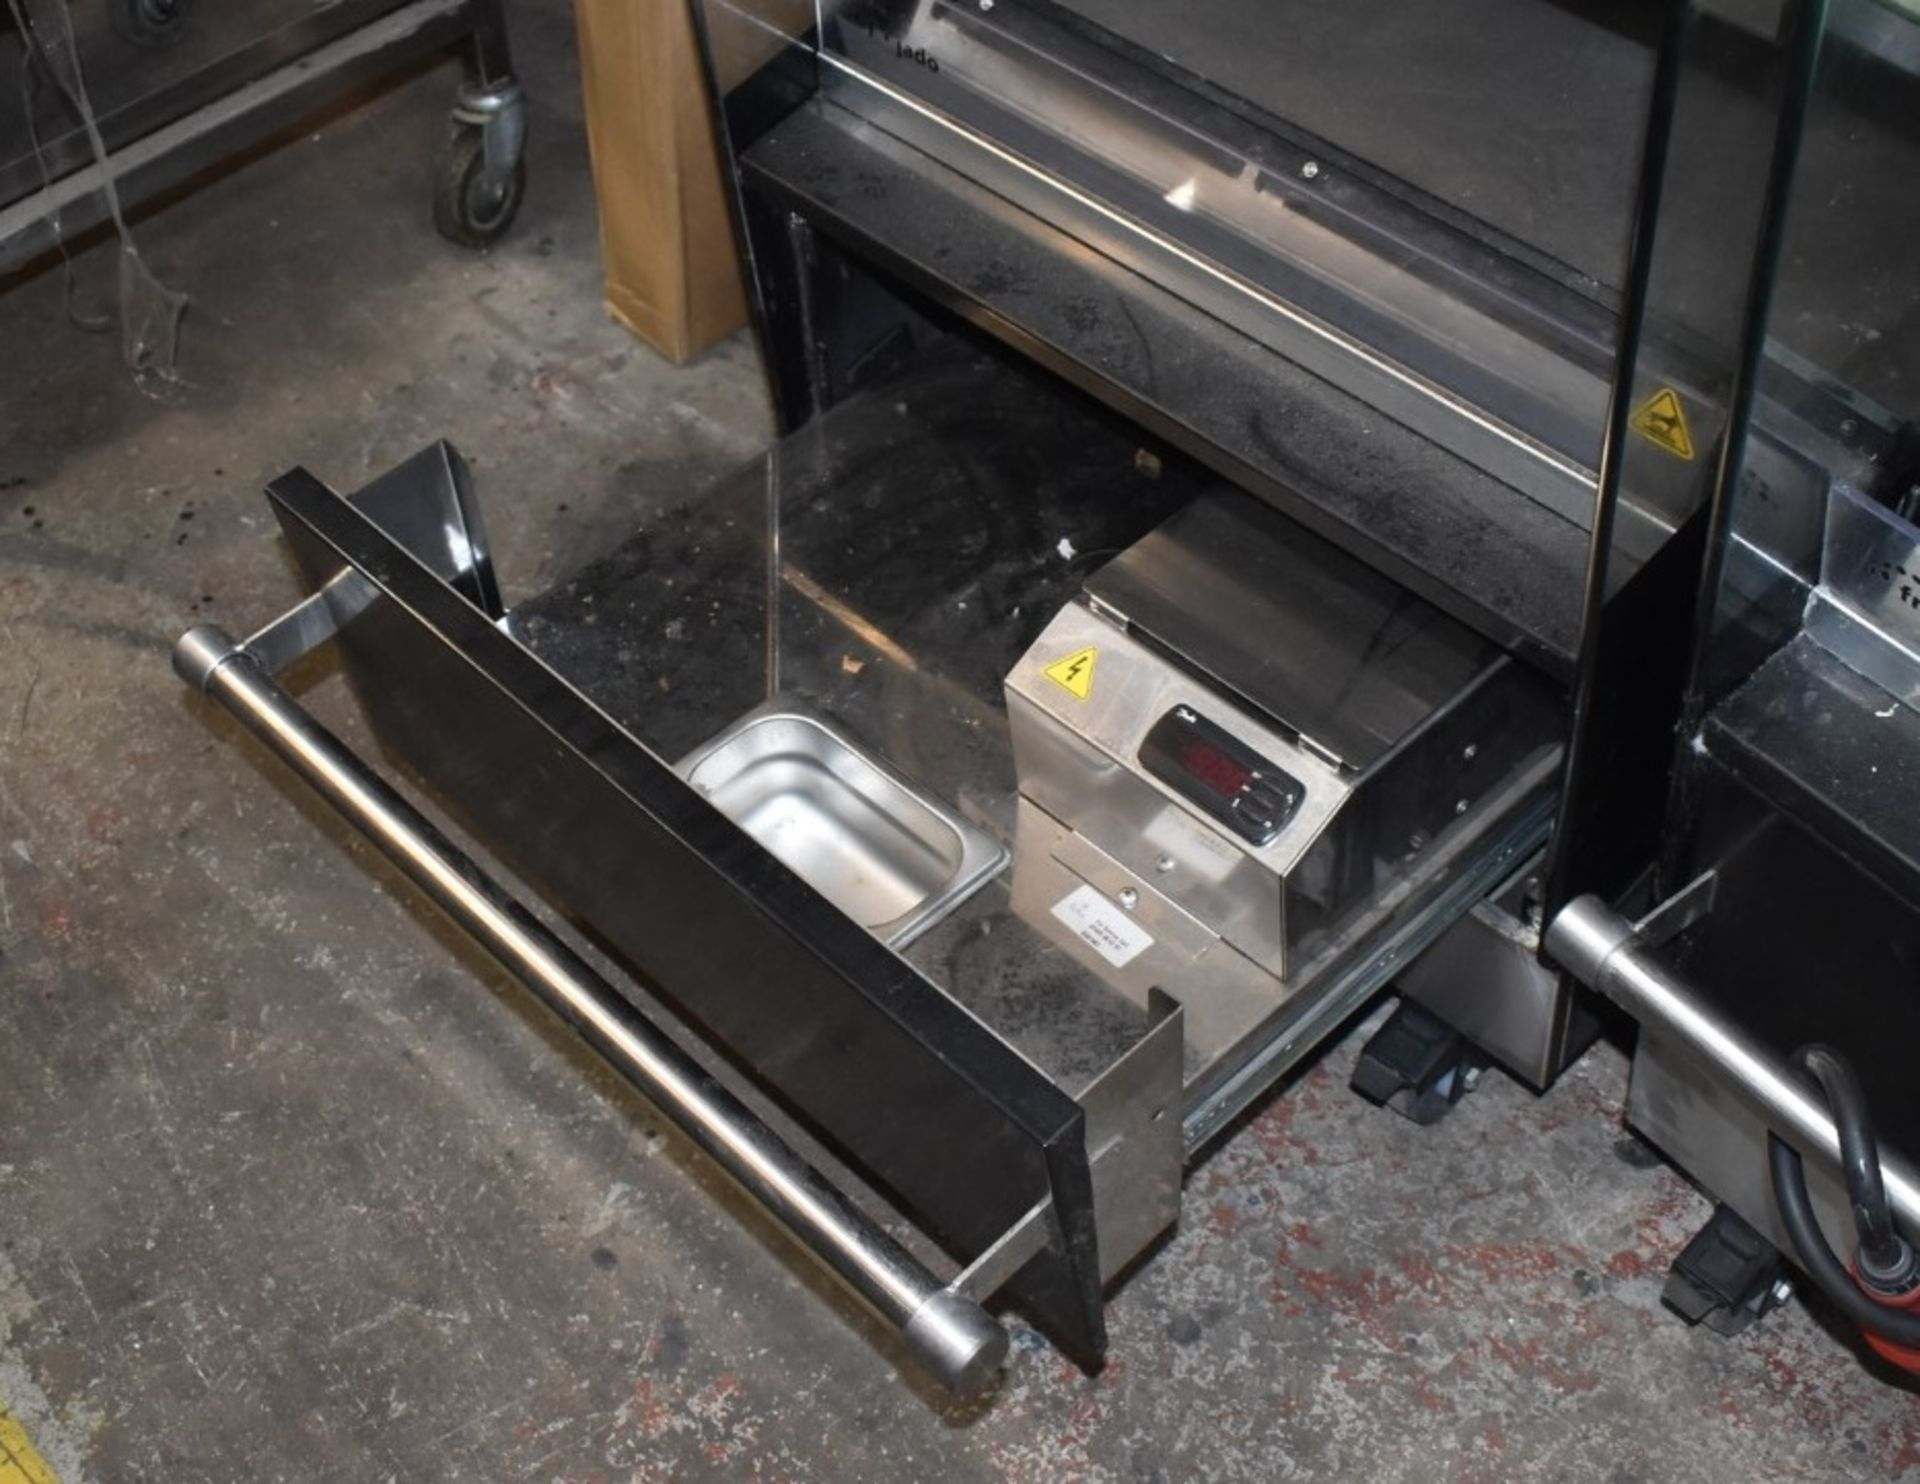 1 x Frijado Multi Deck 60 5 Level Heated Grab and Go Display Warmer - 400v 3 Phase - H197 x W60 x - Image 6 of 7